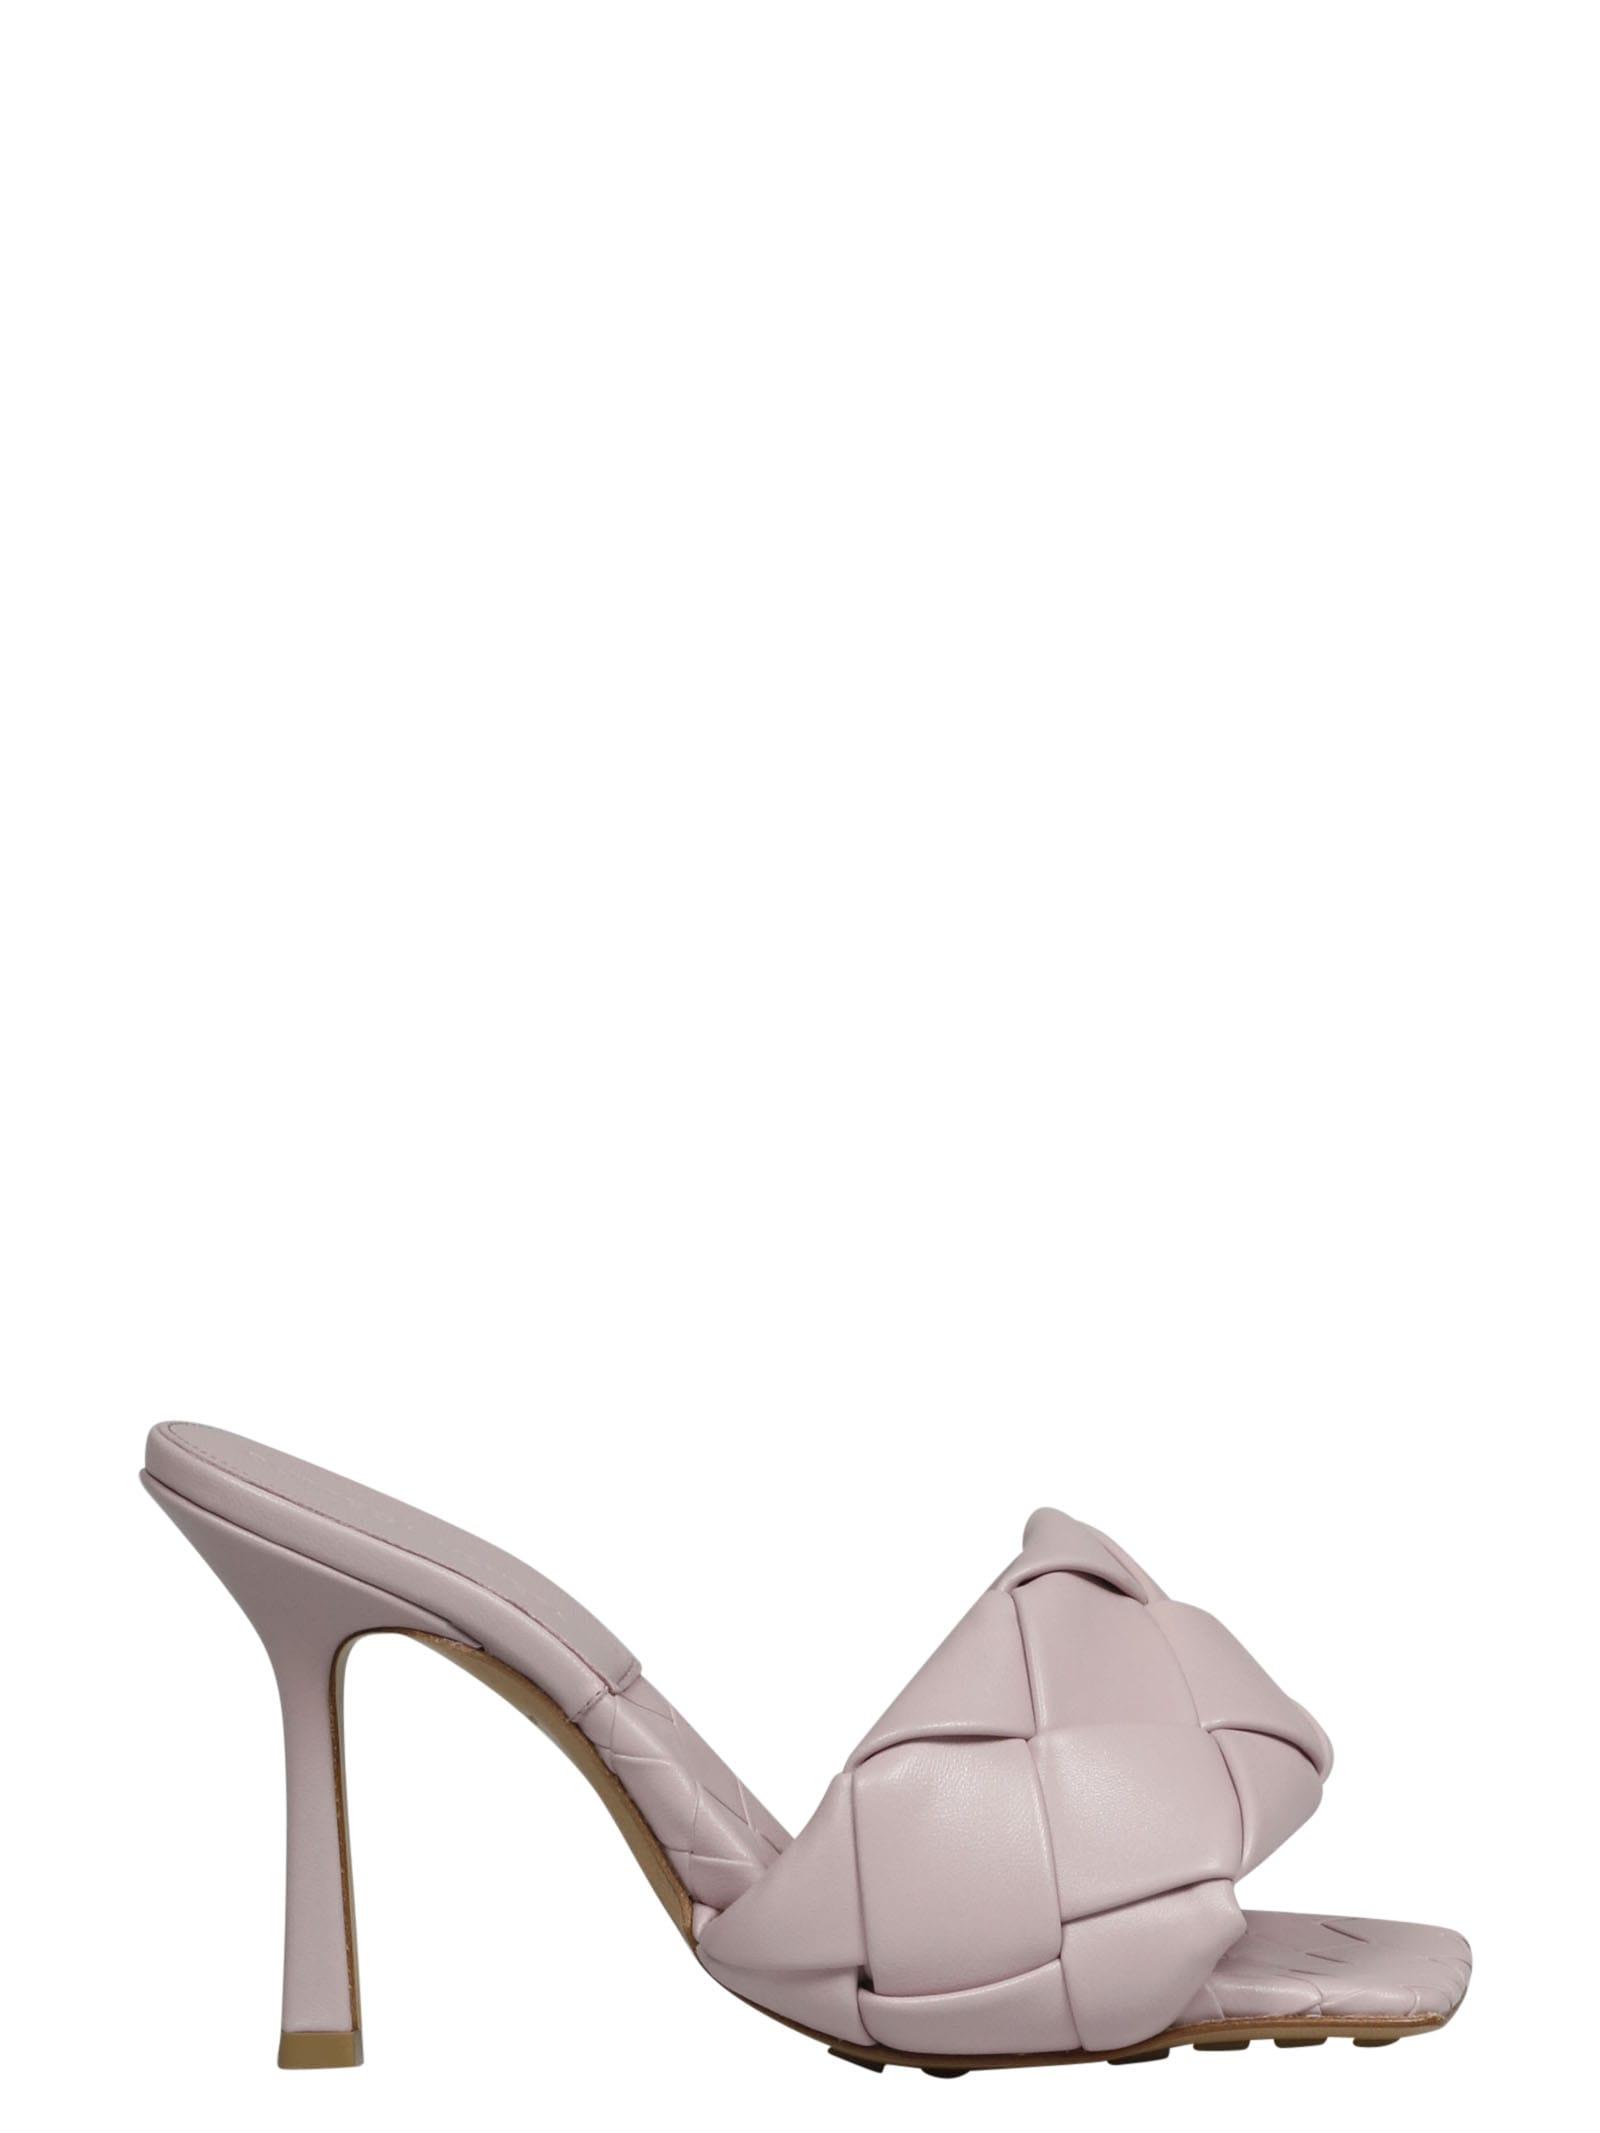 Buy Bottega Veneta Lido Sandal online, shop Bottega Veneta shoes with free shipping